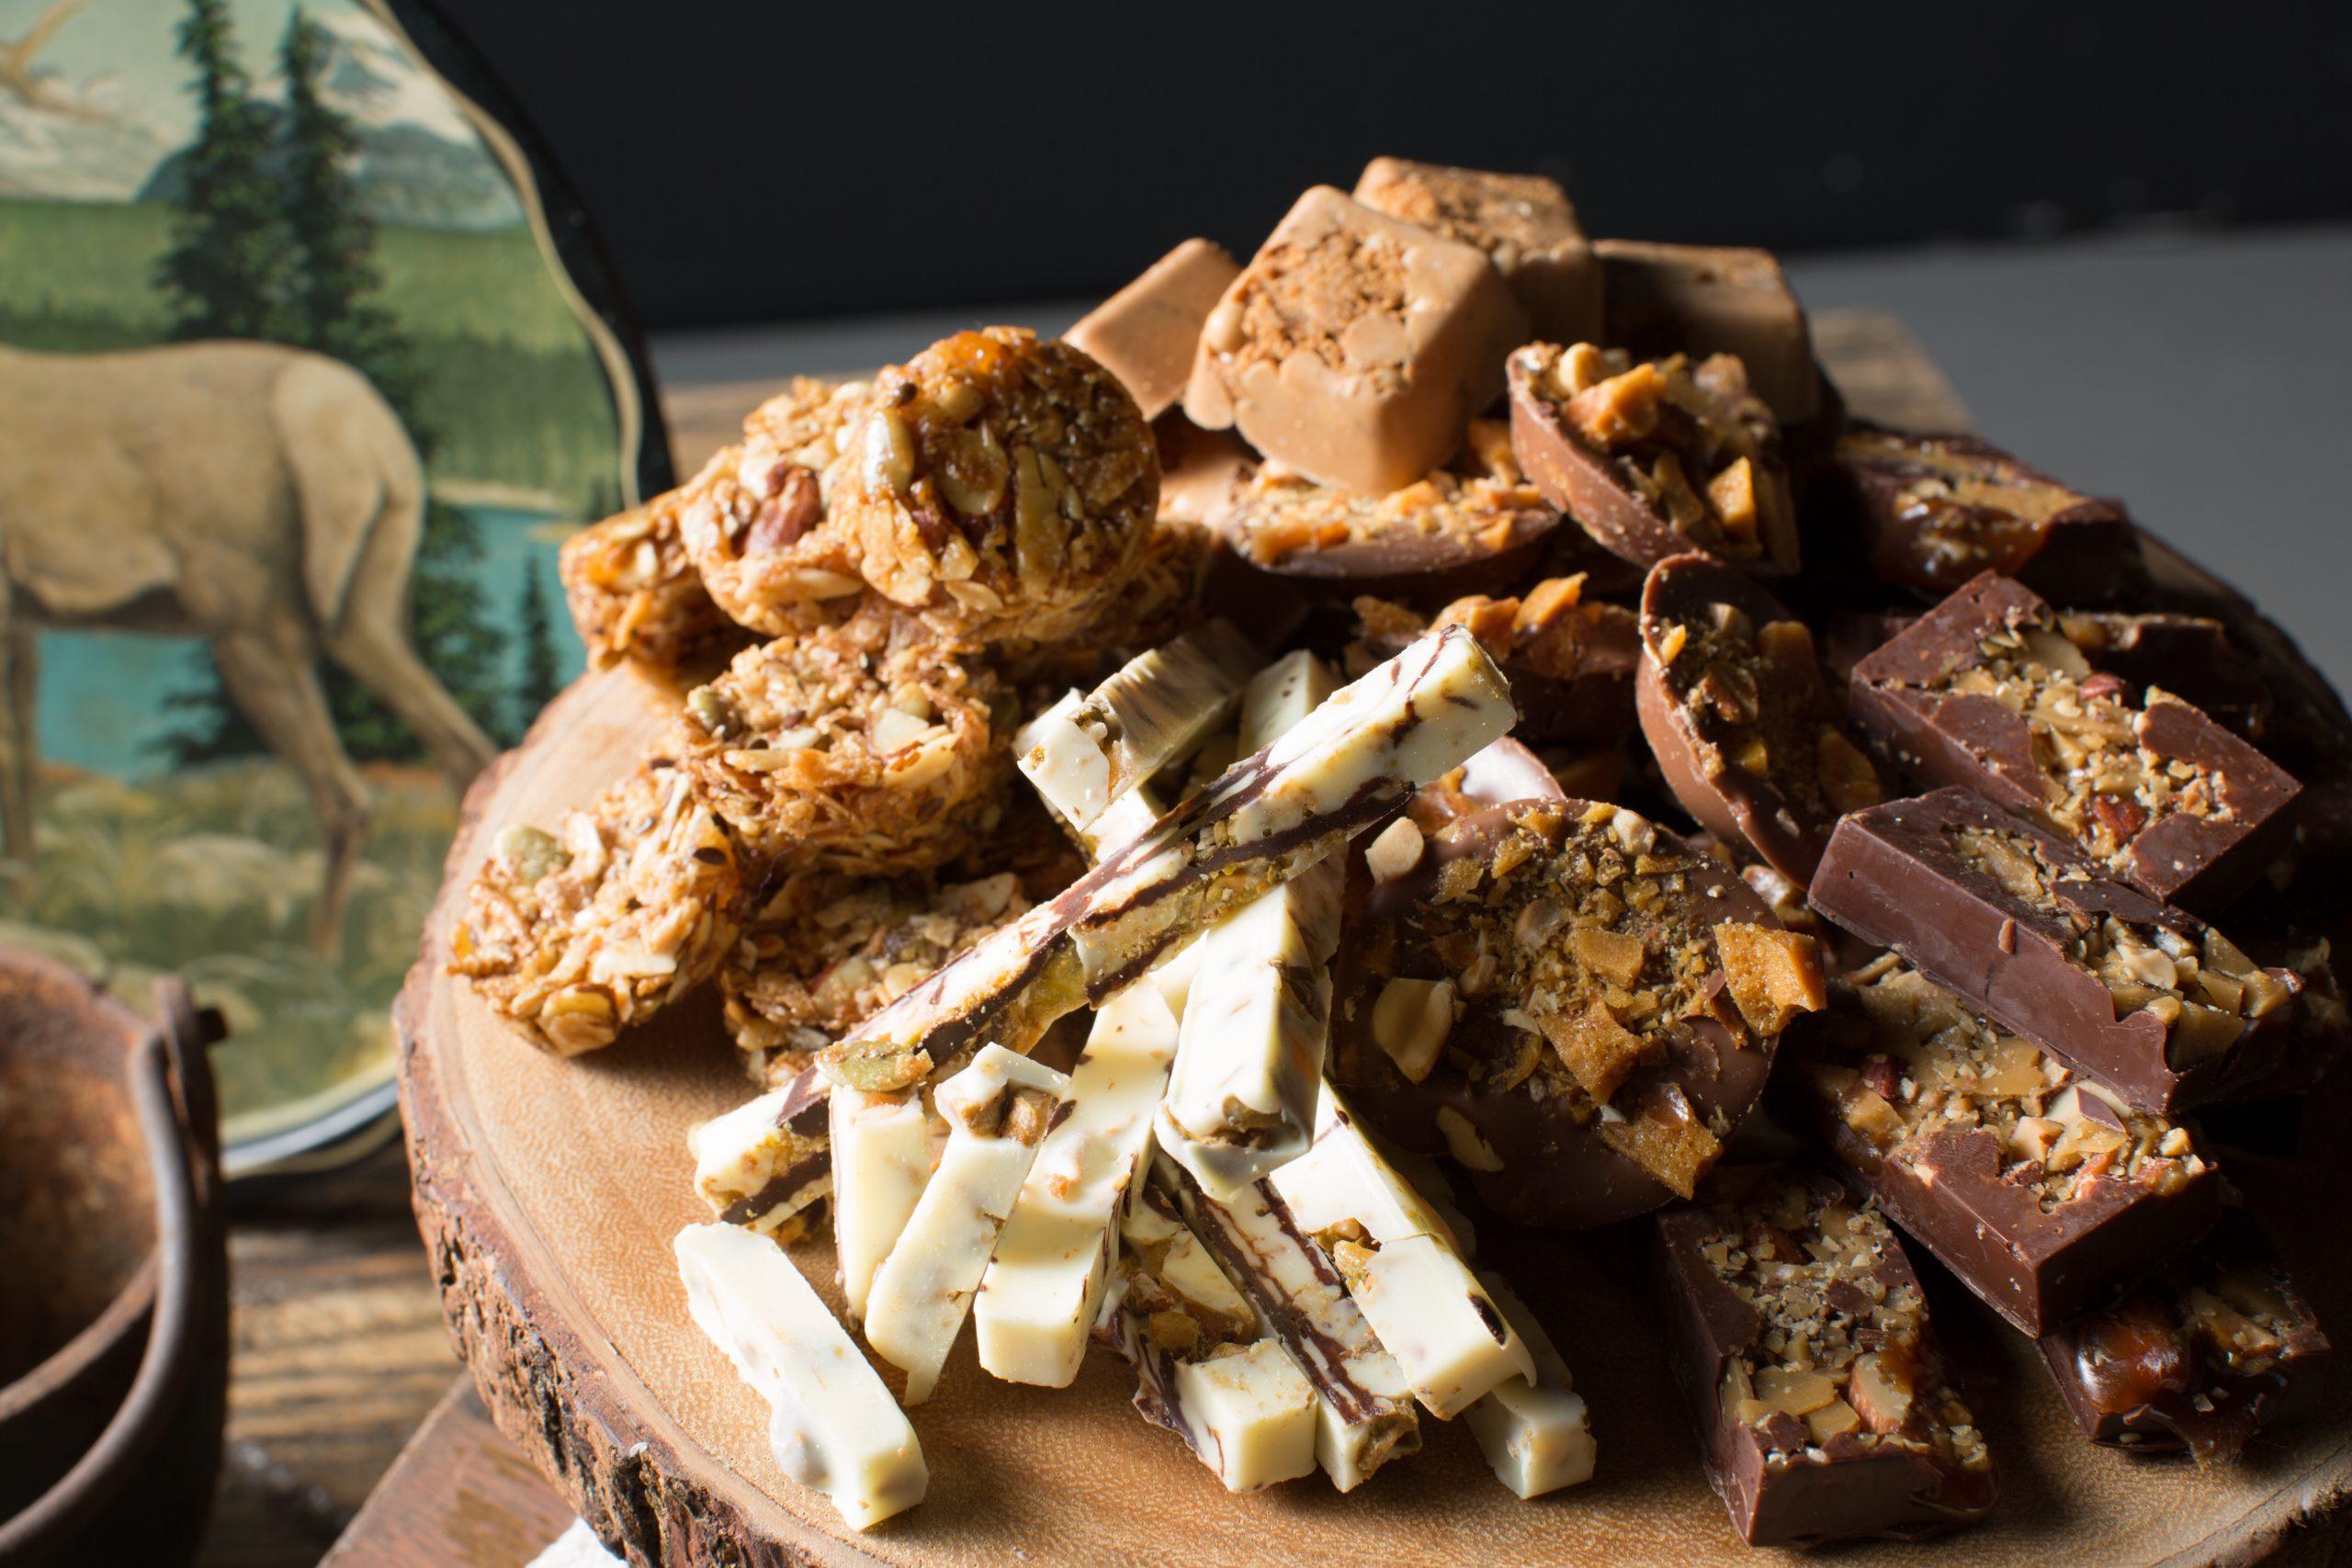 A selection of Segal's edibles